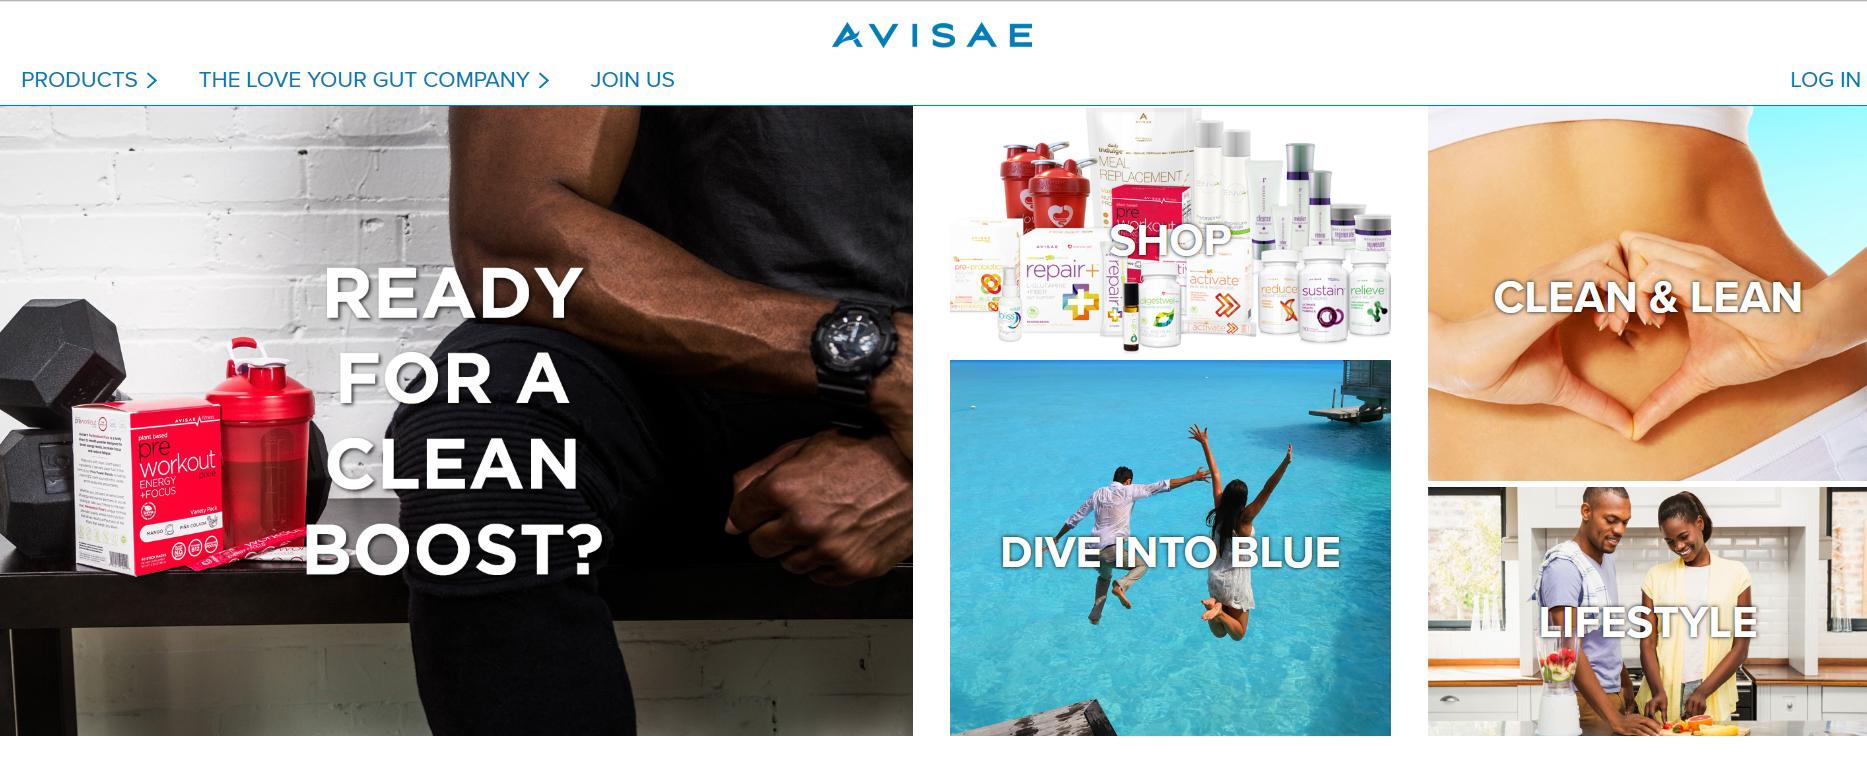 is Avisae a pyramid scheme